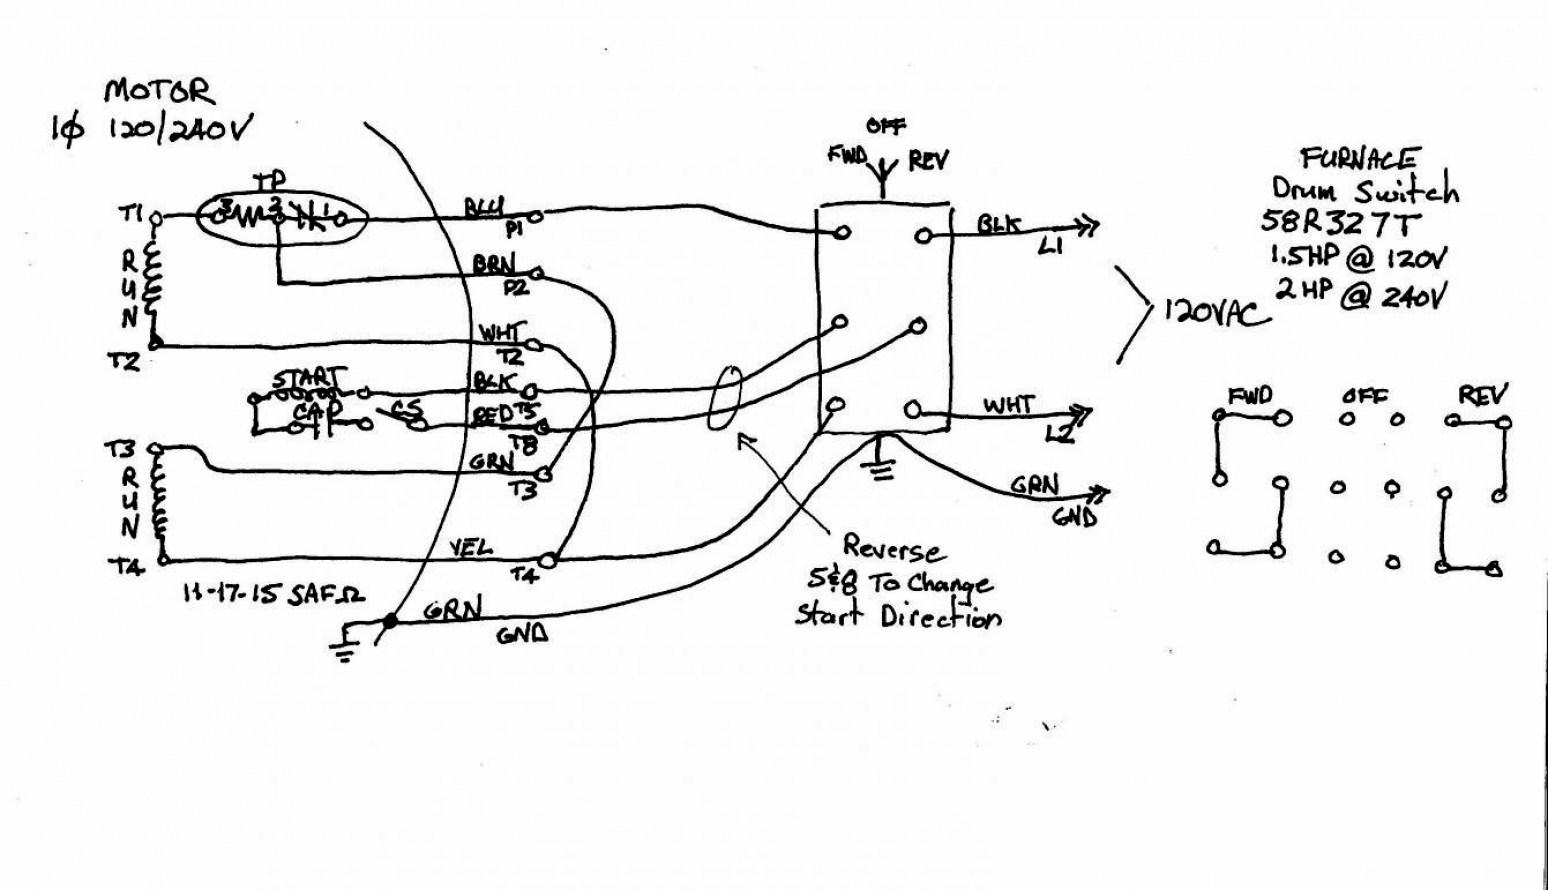 TL_9086] Salzer Drum Switch Switches Wiring Diagram Reversing Wiring DiagramMarki Hapolo Mohammedshrine Librar Wiring 101